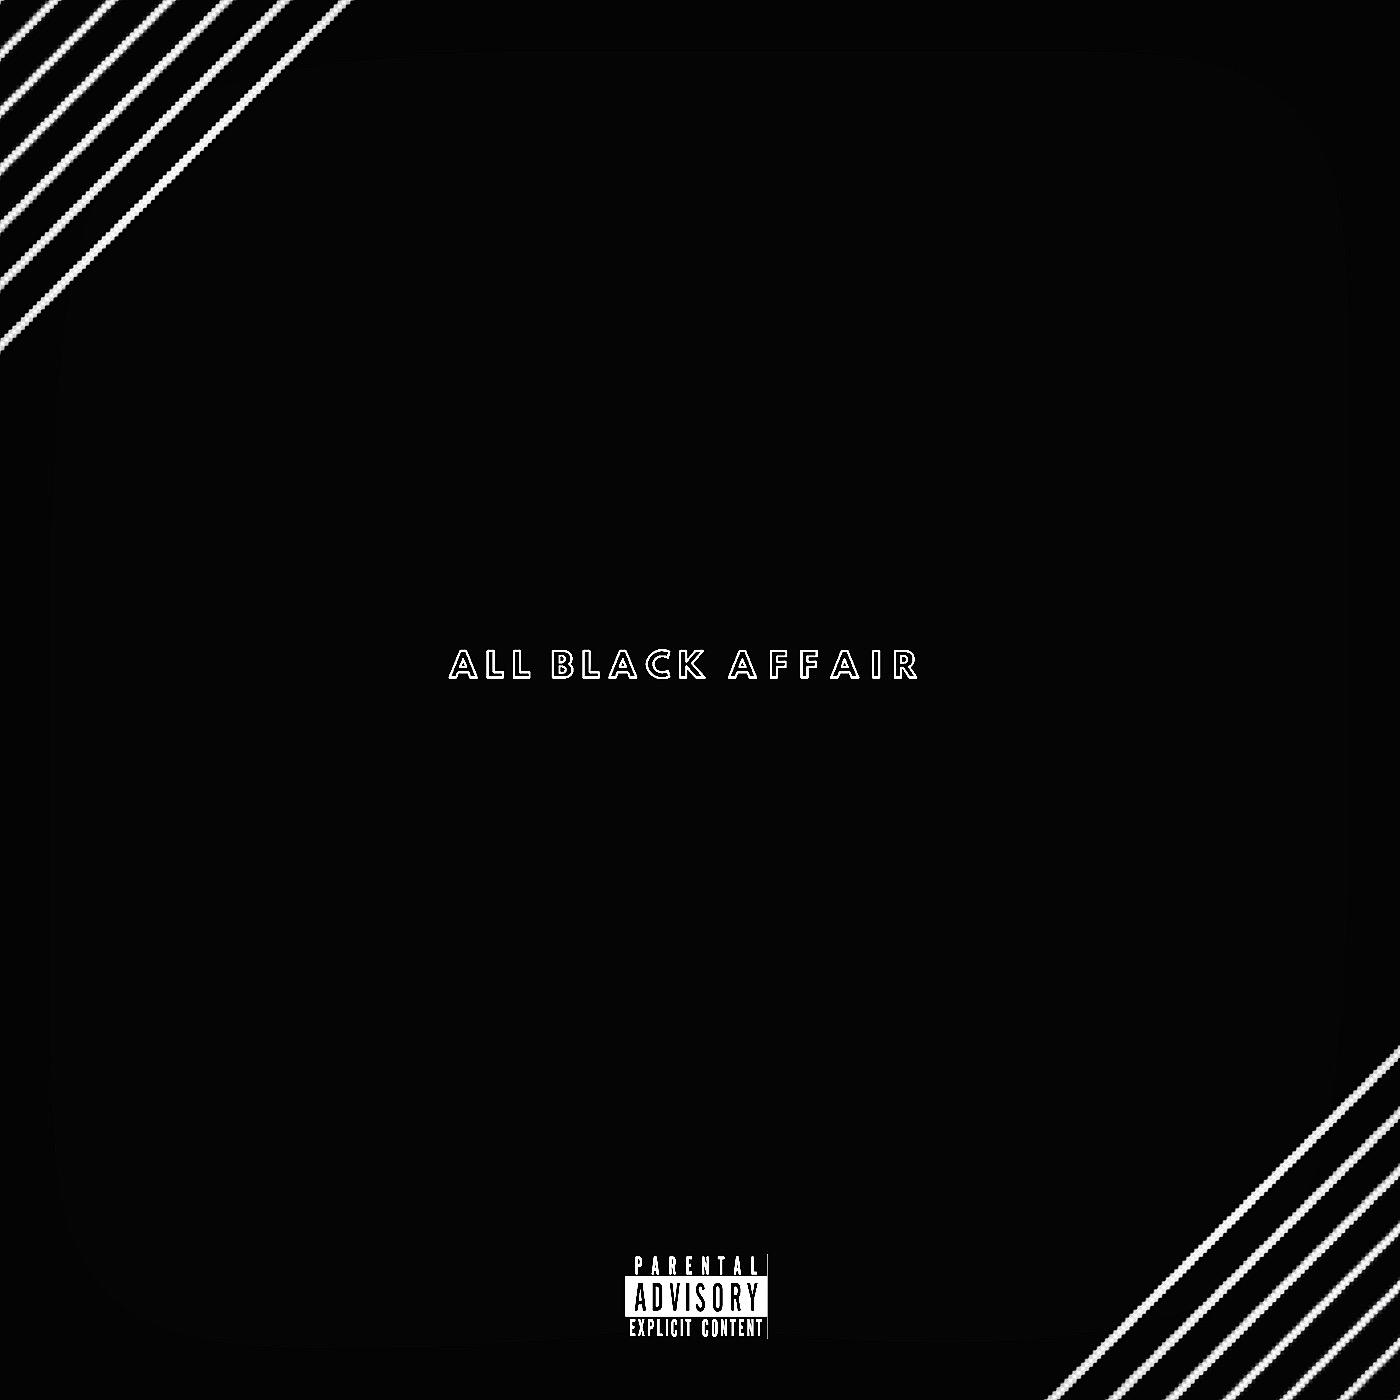 New All Black Affair .JPG